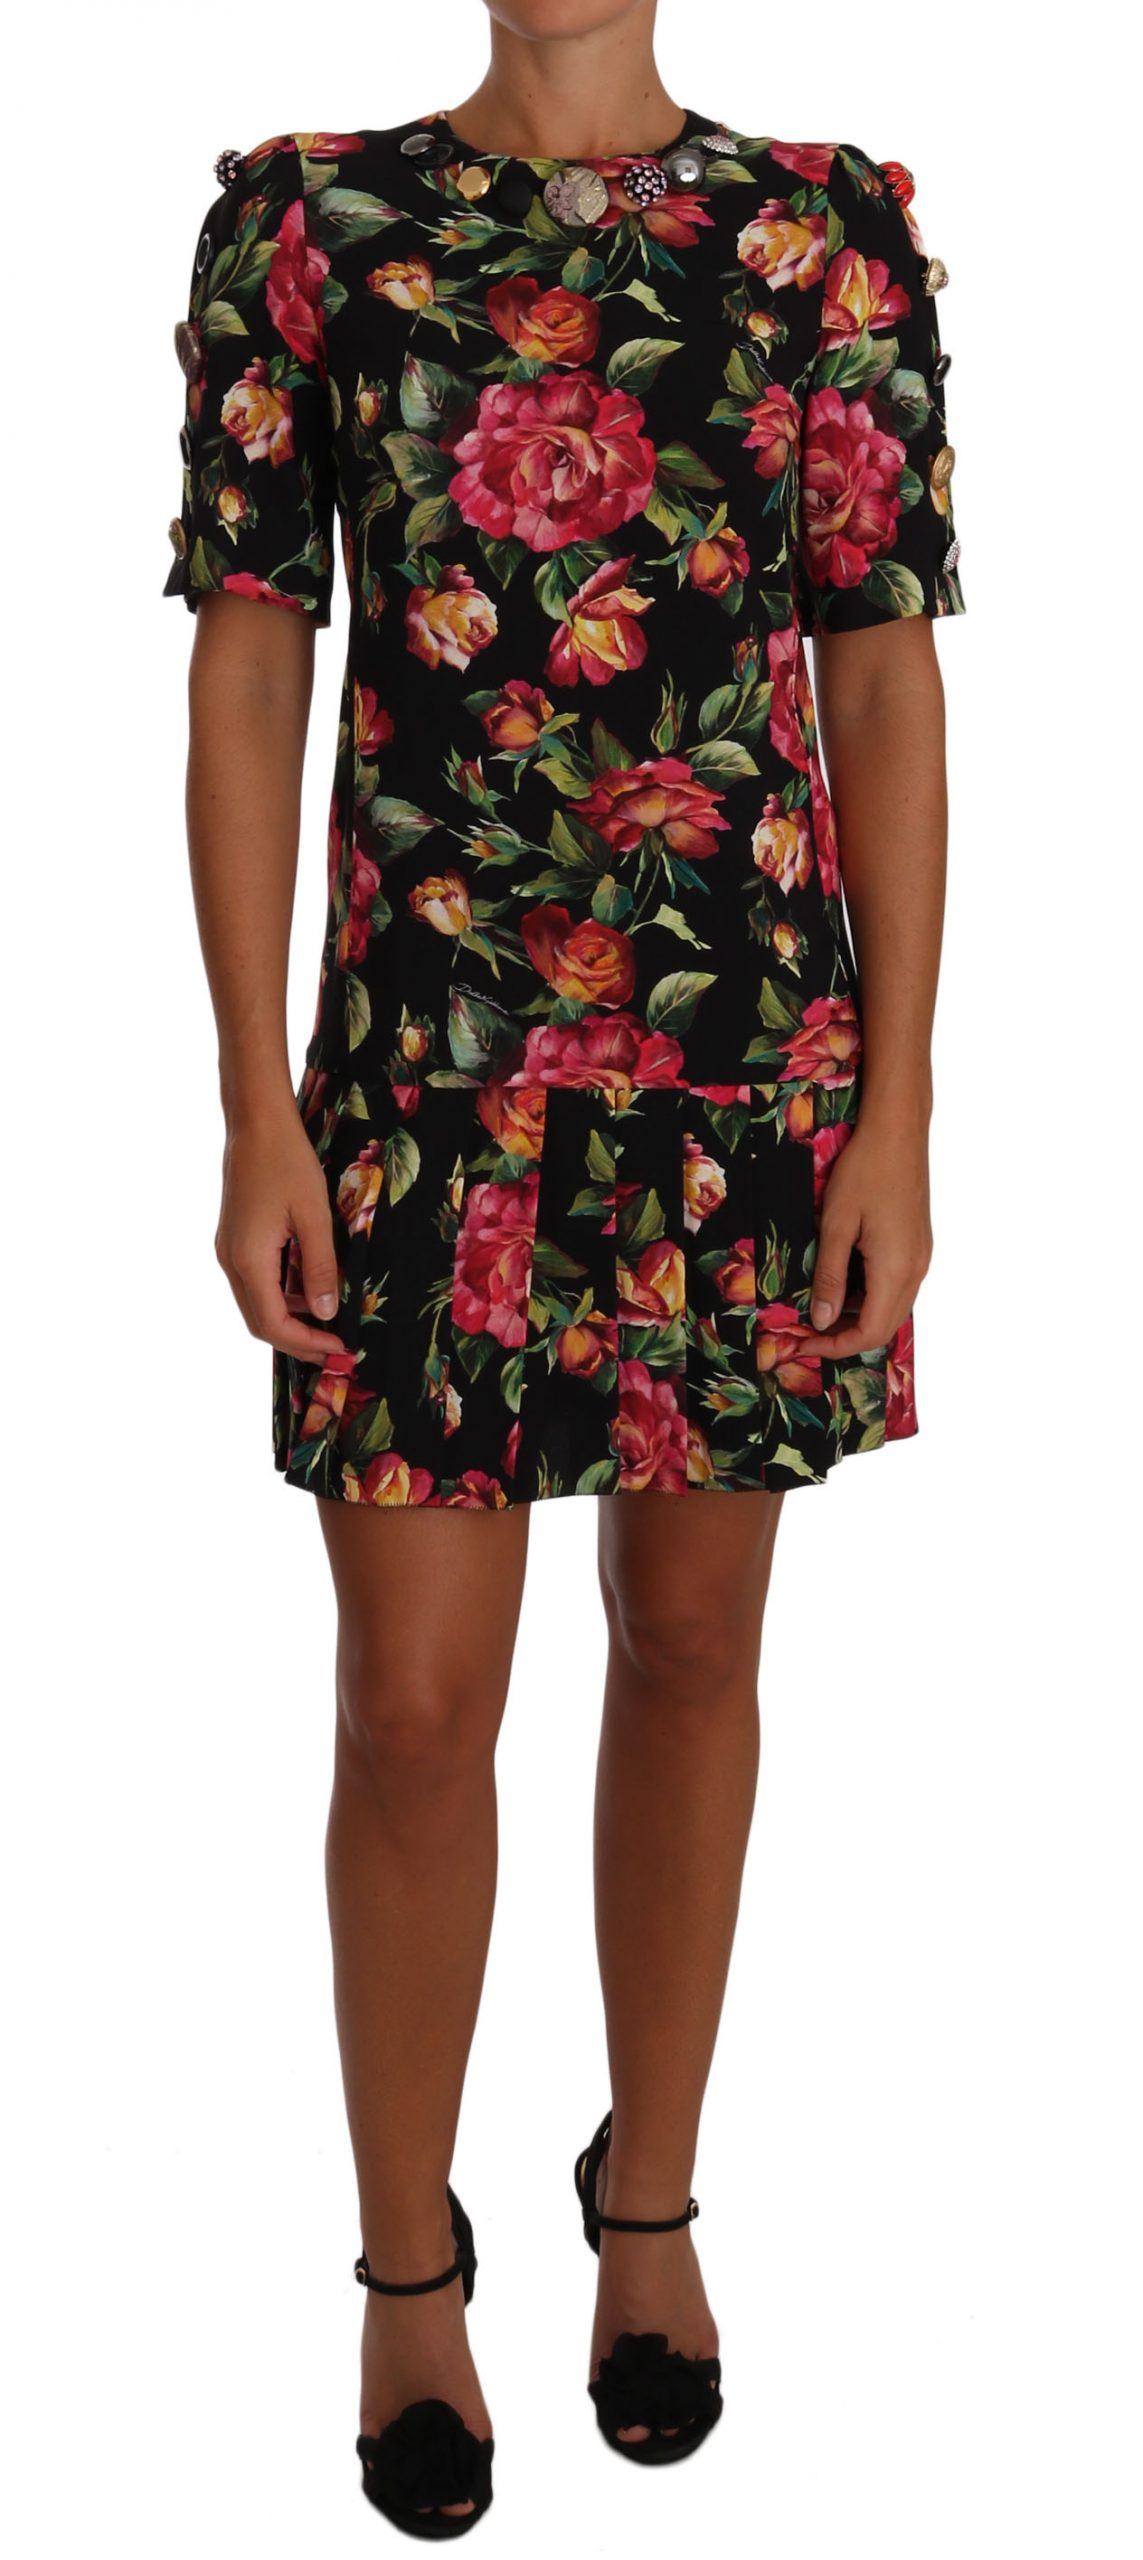 Dolce & Gabbana Women's Floral Crystal Buttons Dress Multicolor DR1444 - IT38 XS